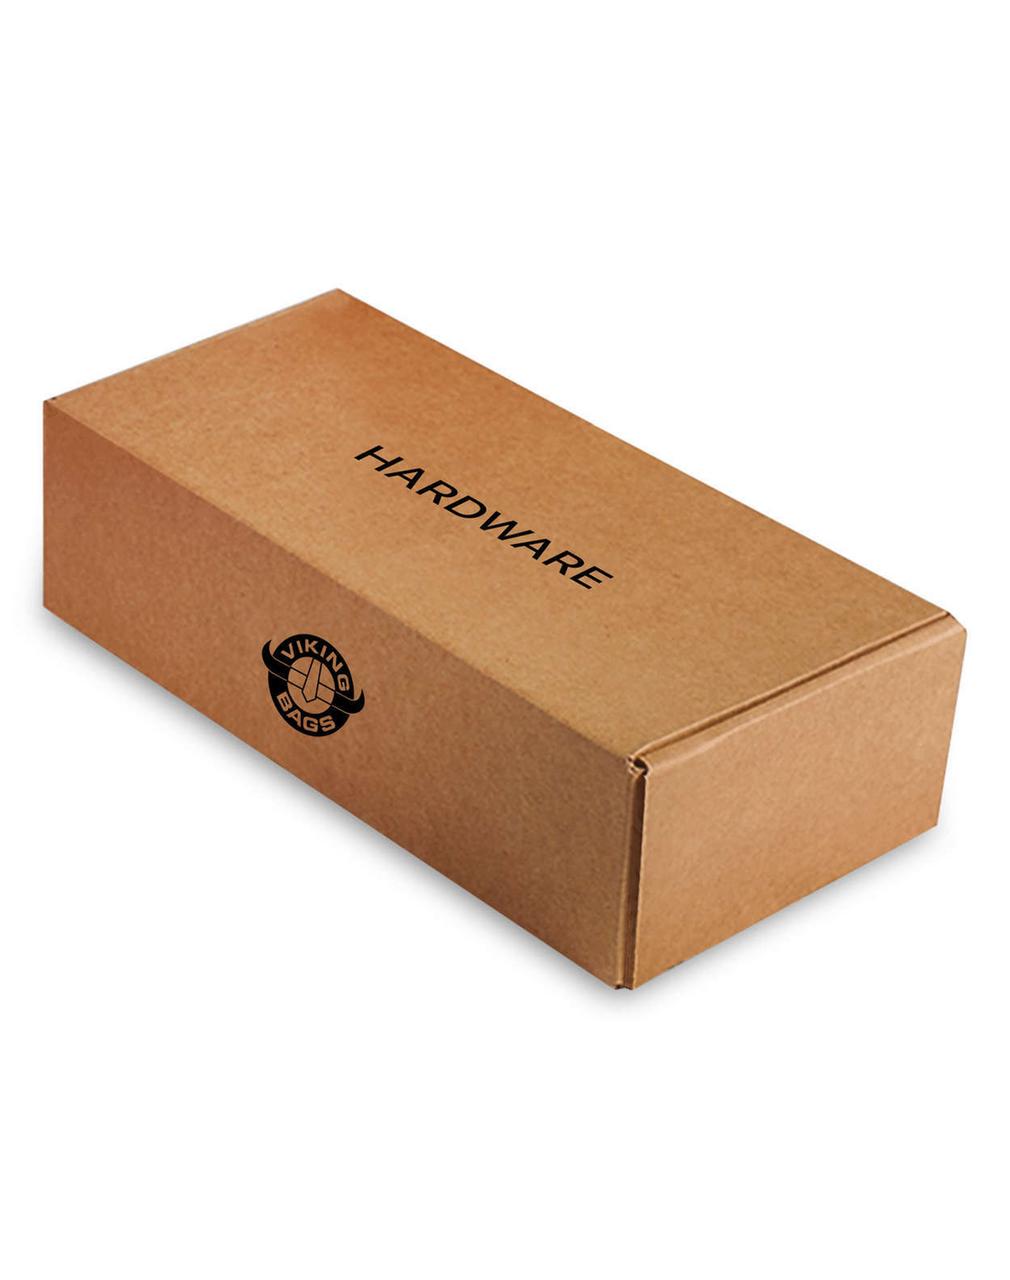 Triumph Thunderbird Viking Warrior Series Large Motorcycle SaddleBags Box